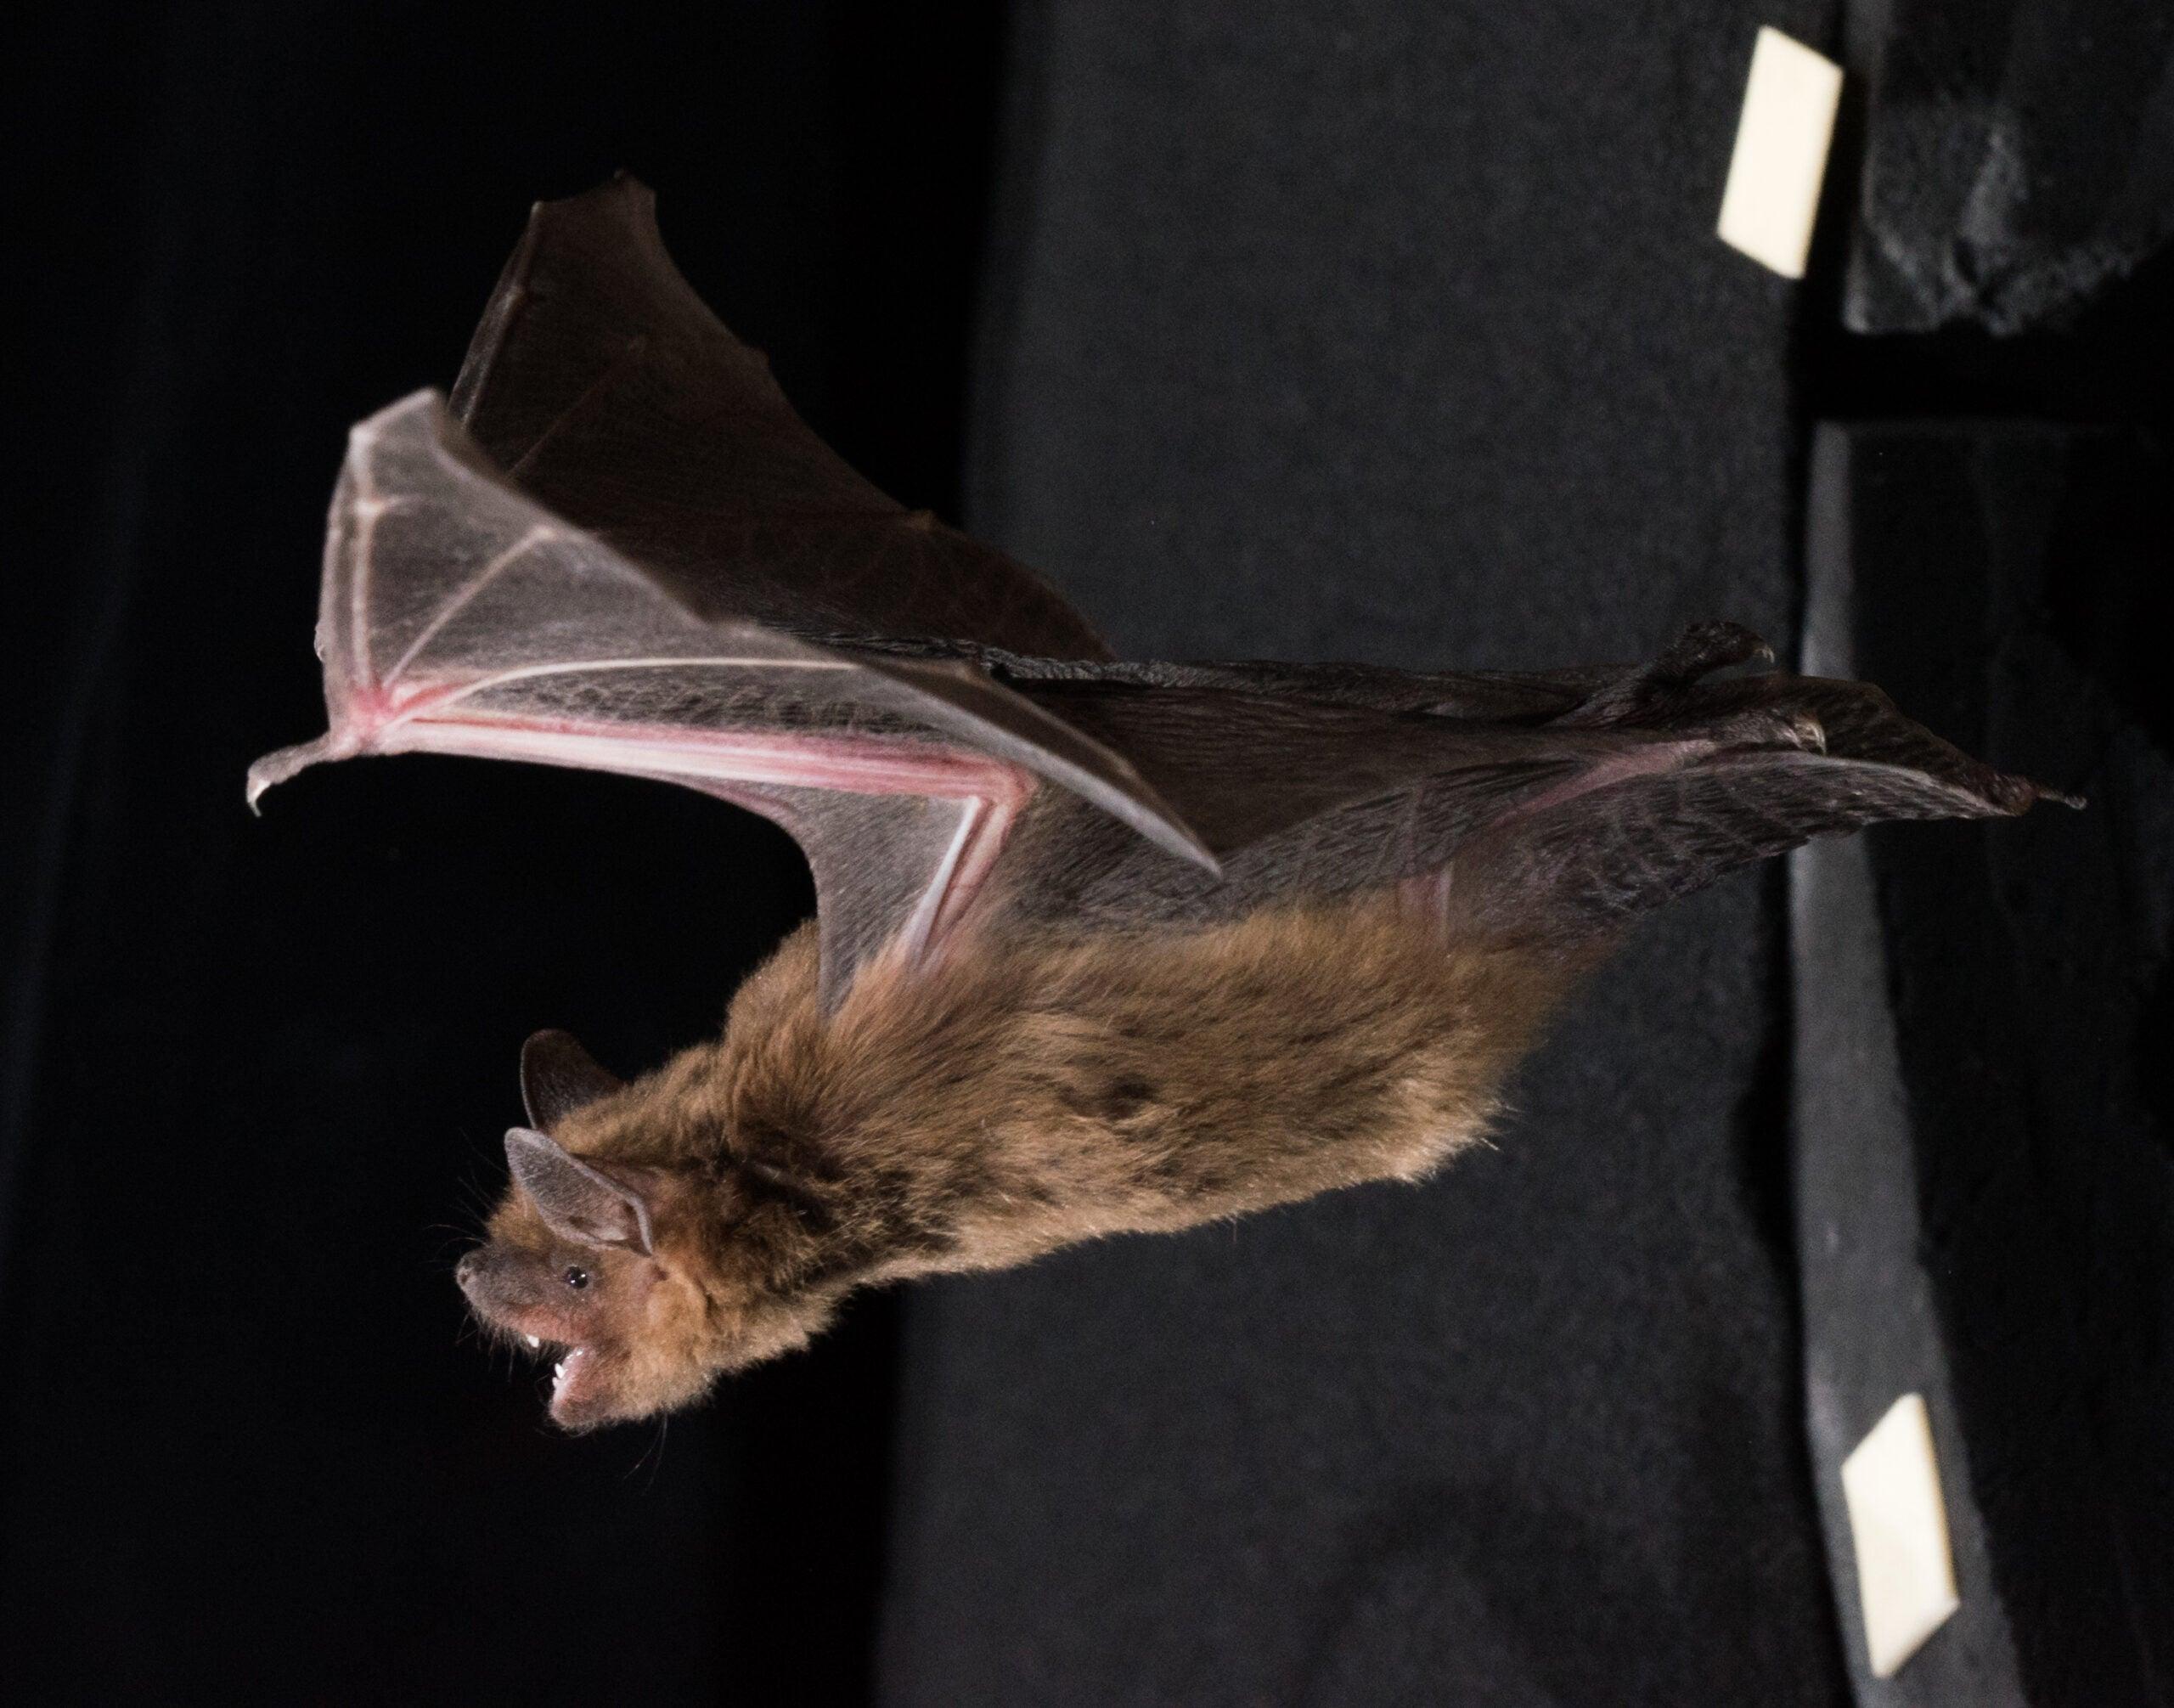 Bat echolocation could help us understand ADHD